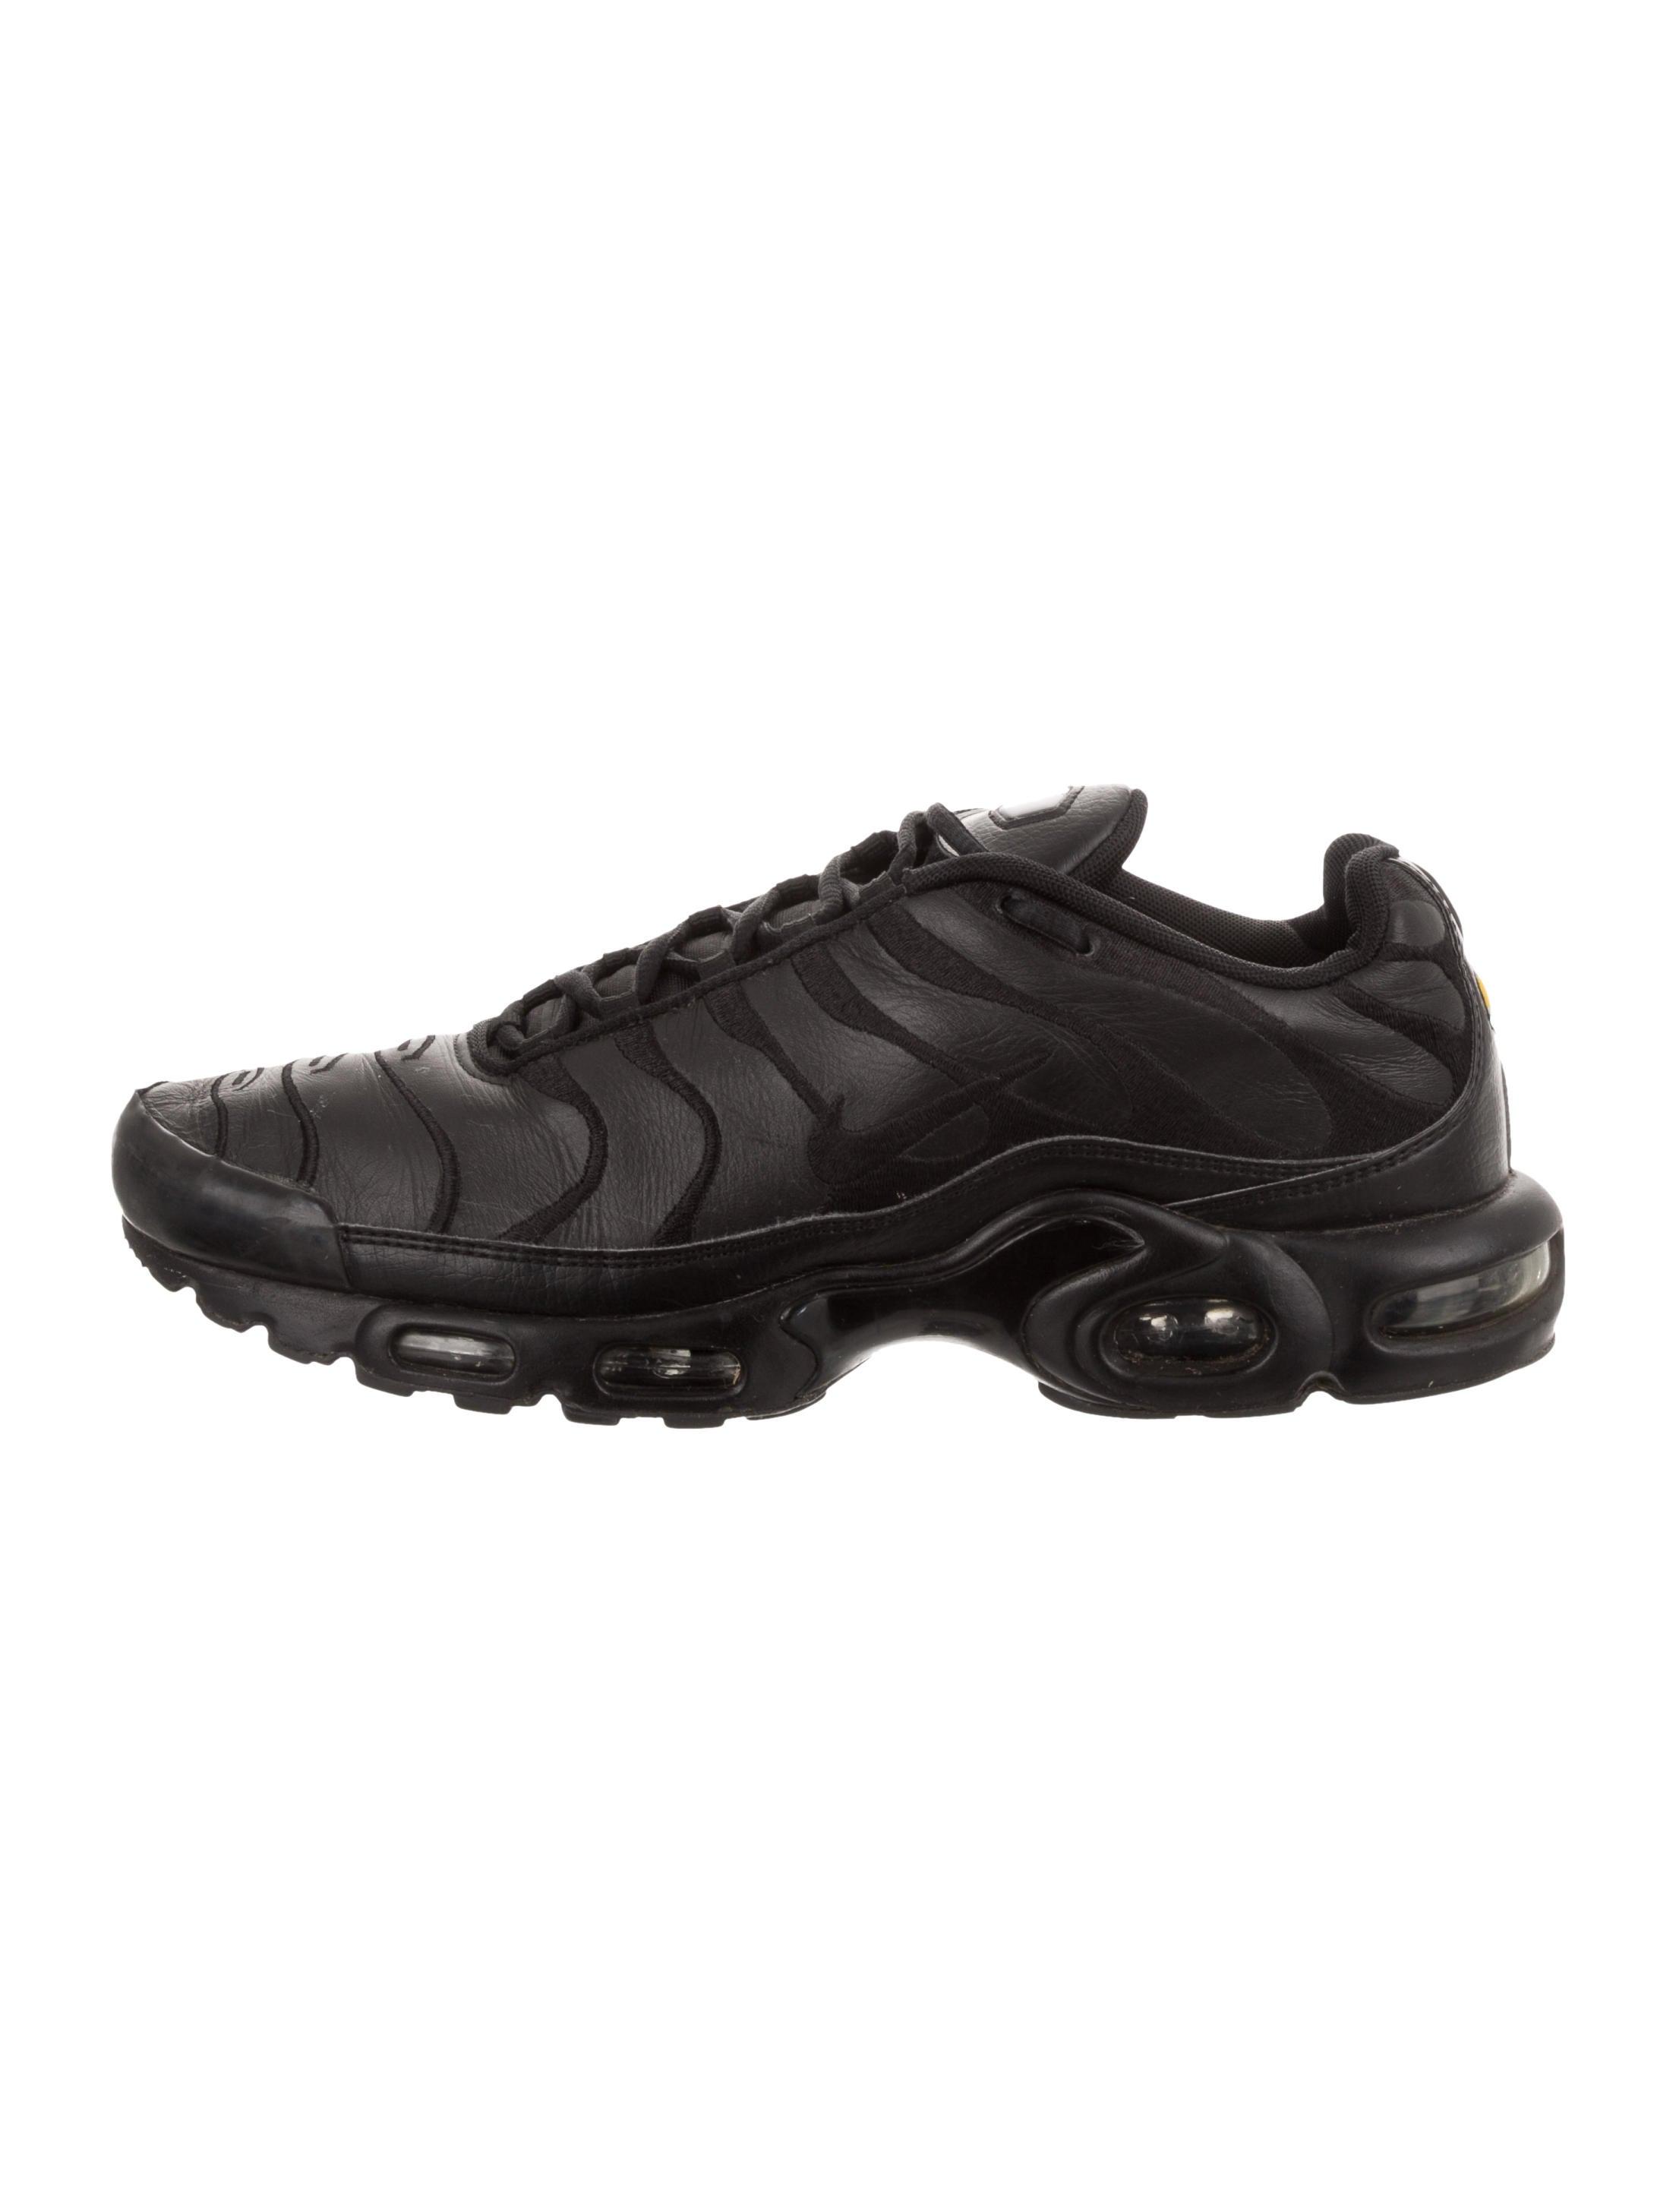 Nike 2019 Air Max Plus TN 'Triple Black' Sneakers - Shoes ...